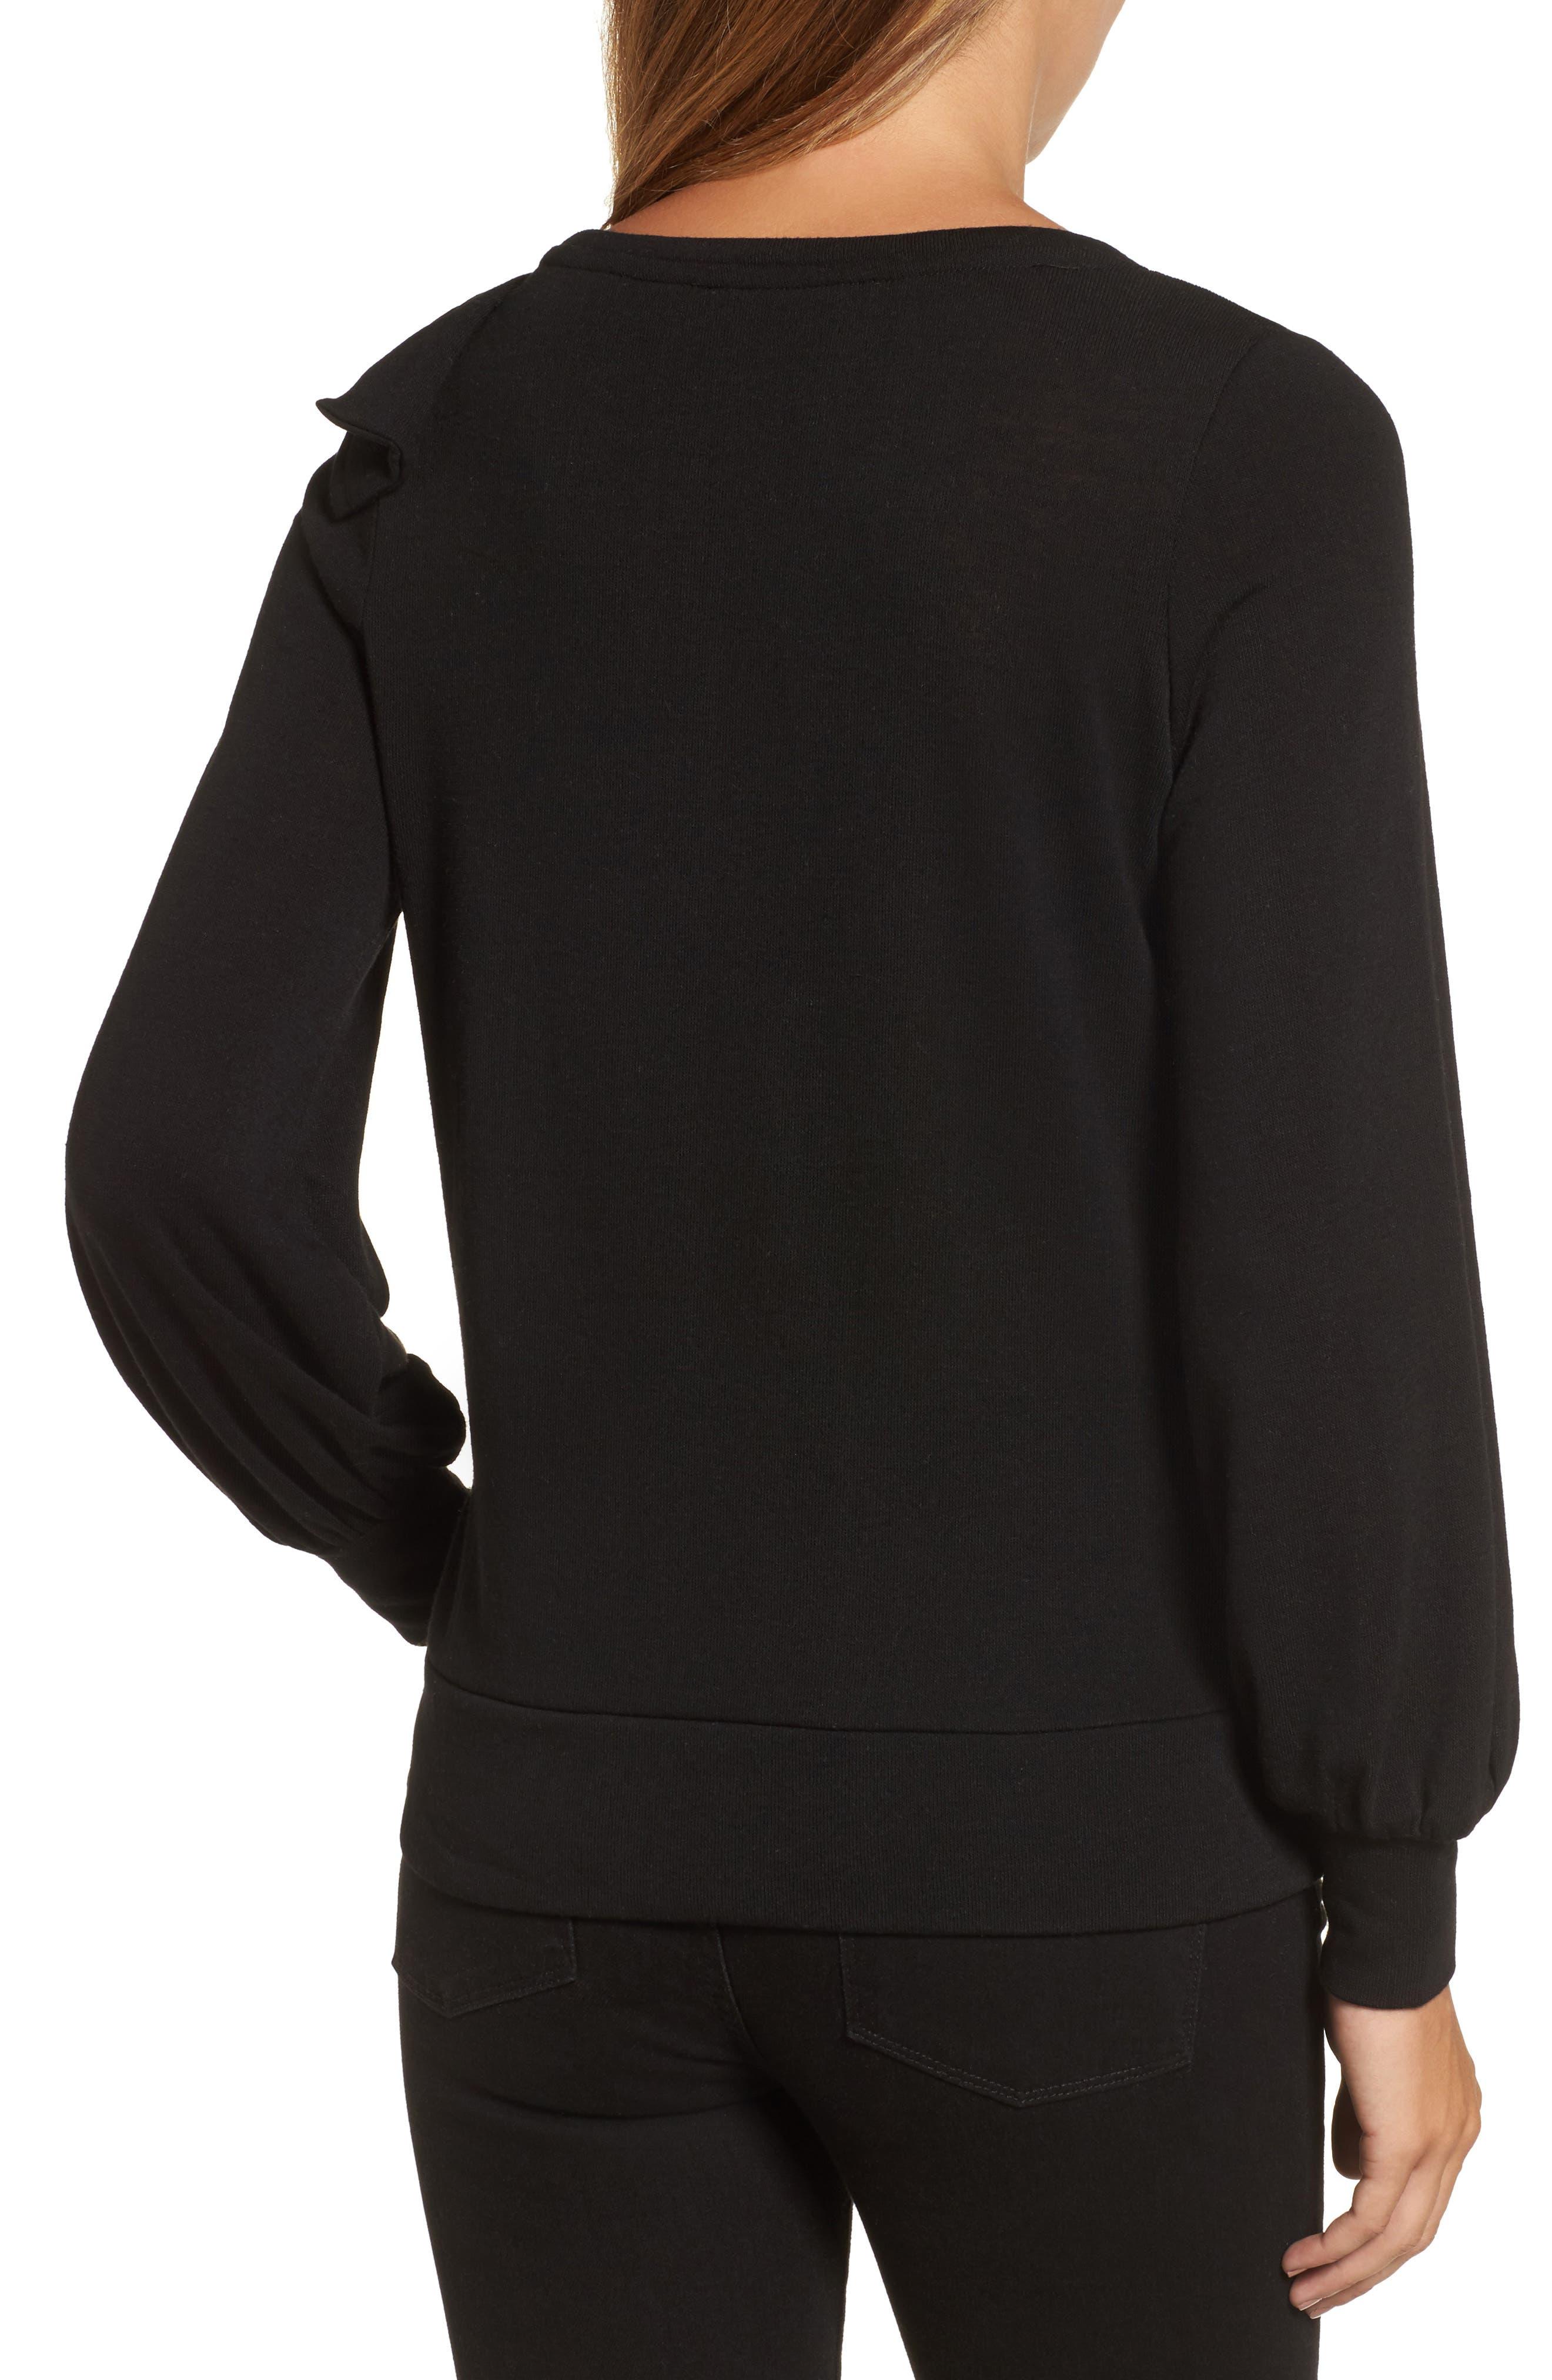 Bow Knit Sweatshirt,                             Alternate thumbnail 2, color,                             001